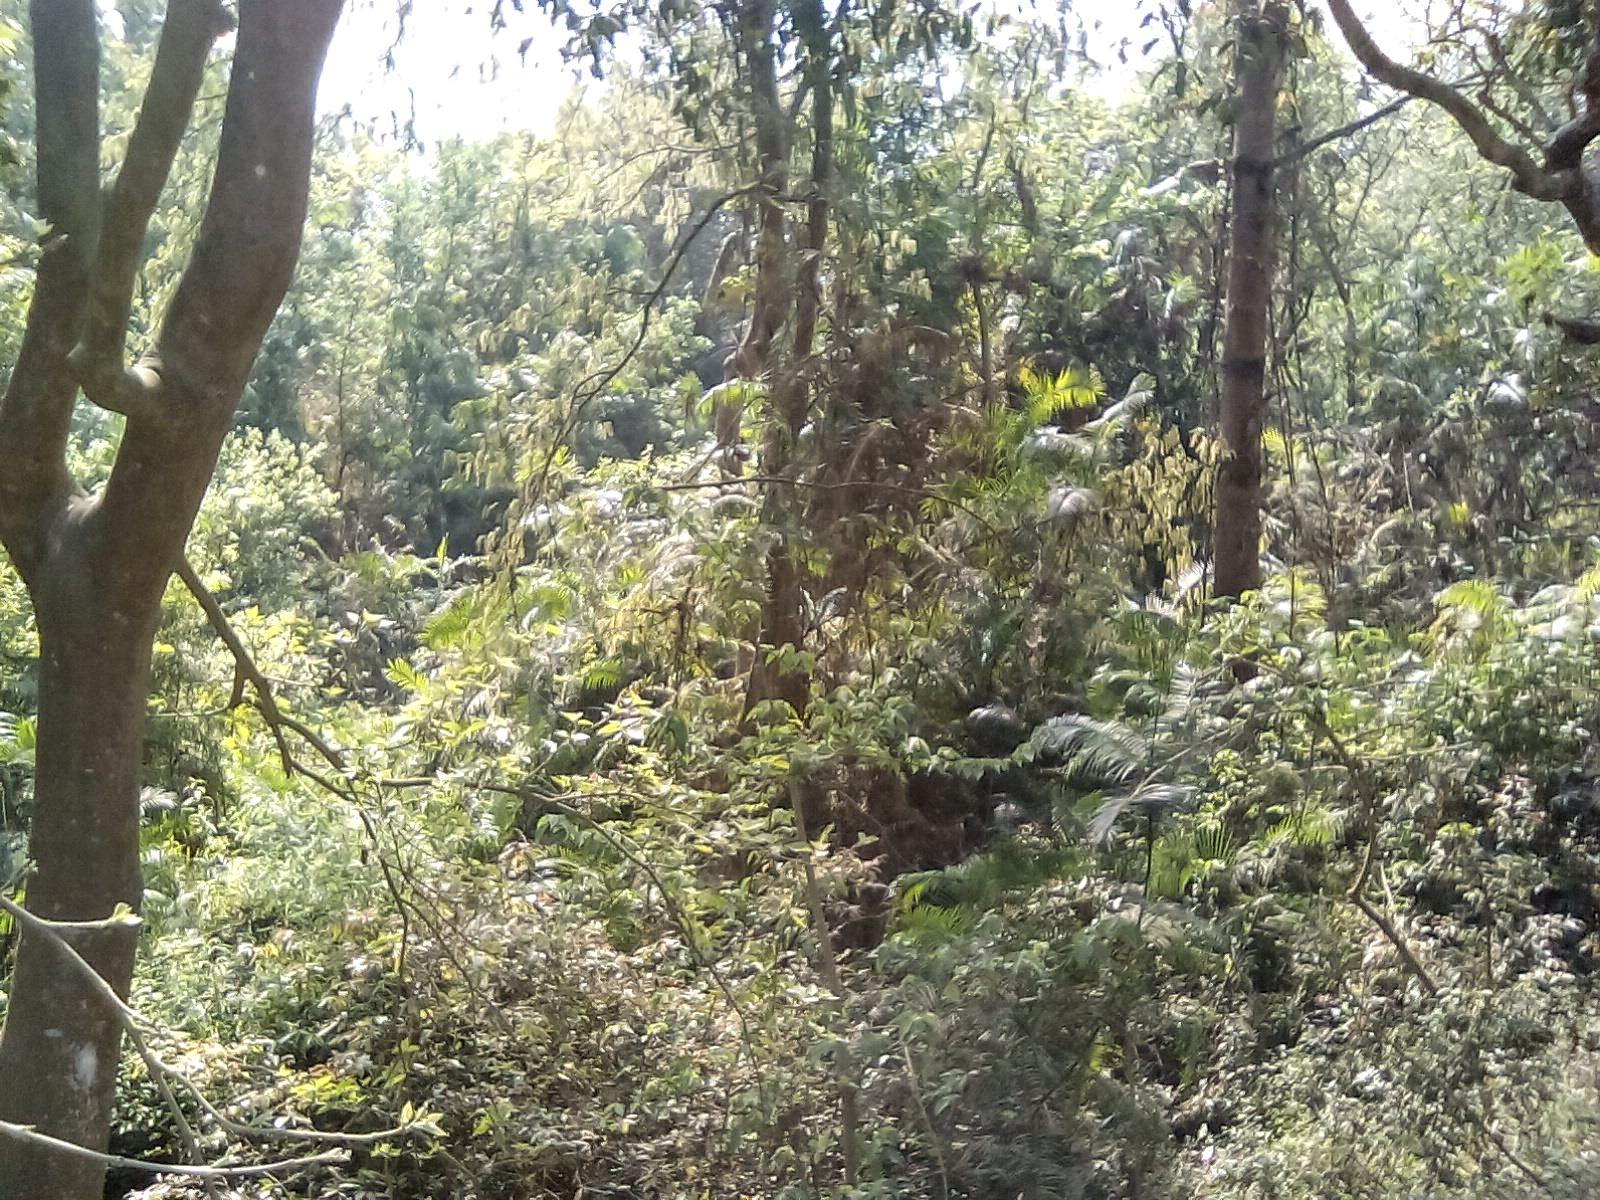 lumbini nepal parc monastique decouverte nature